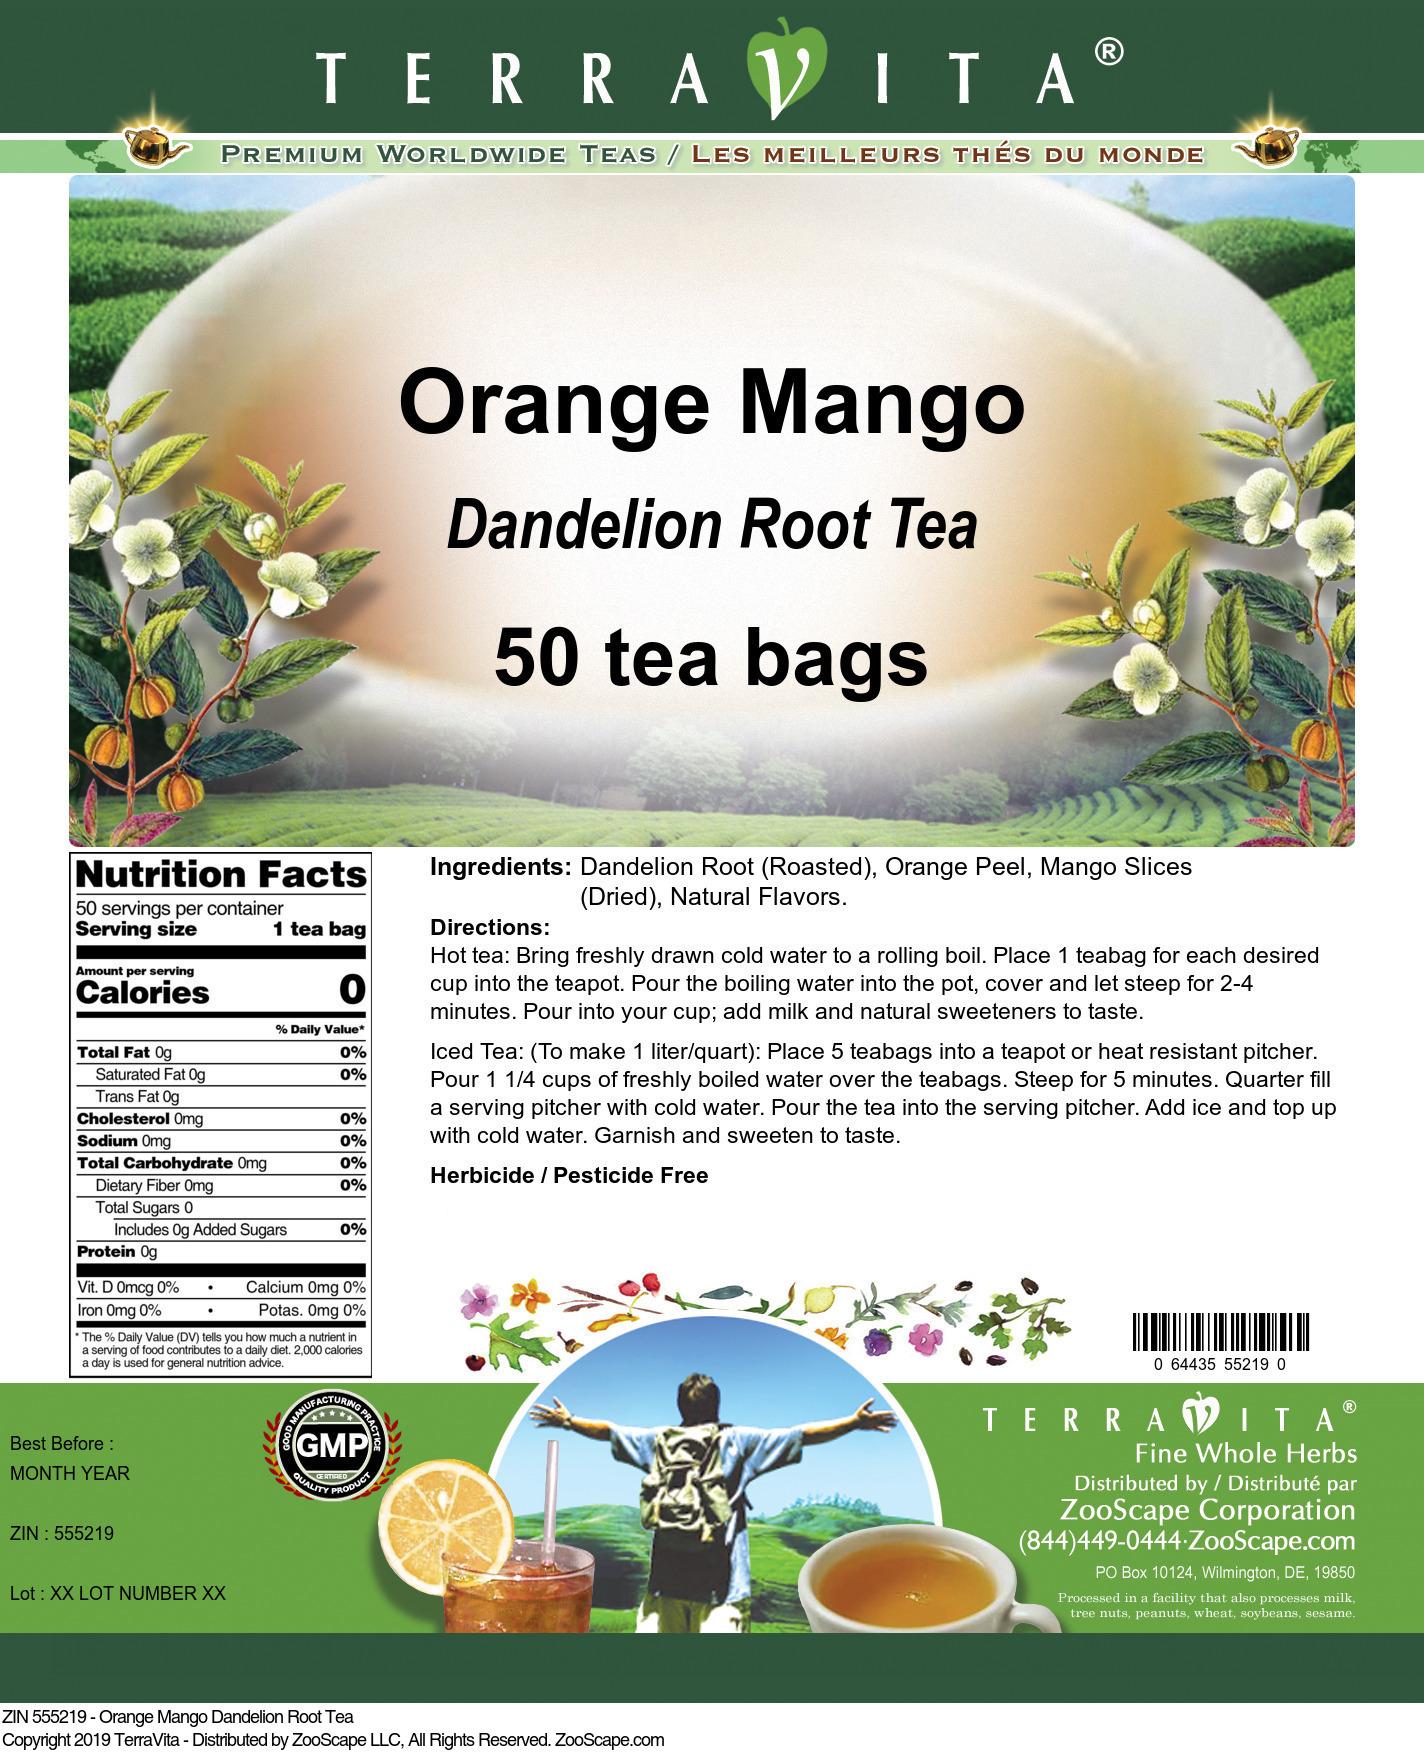 Orange Mango Dandelion Root